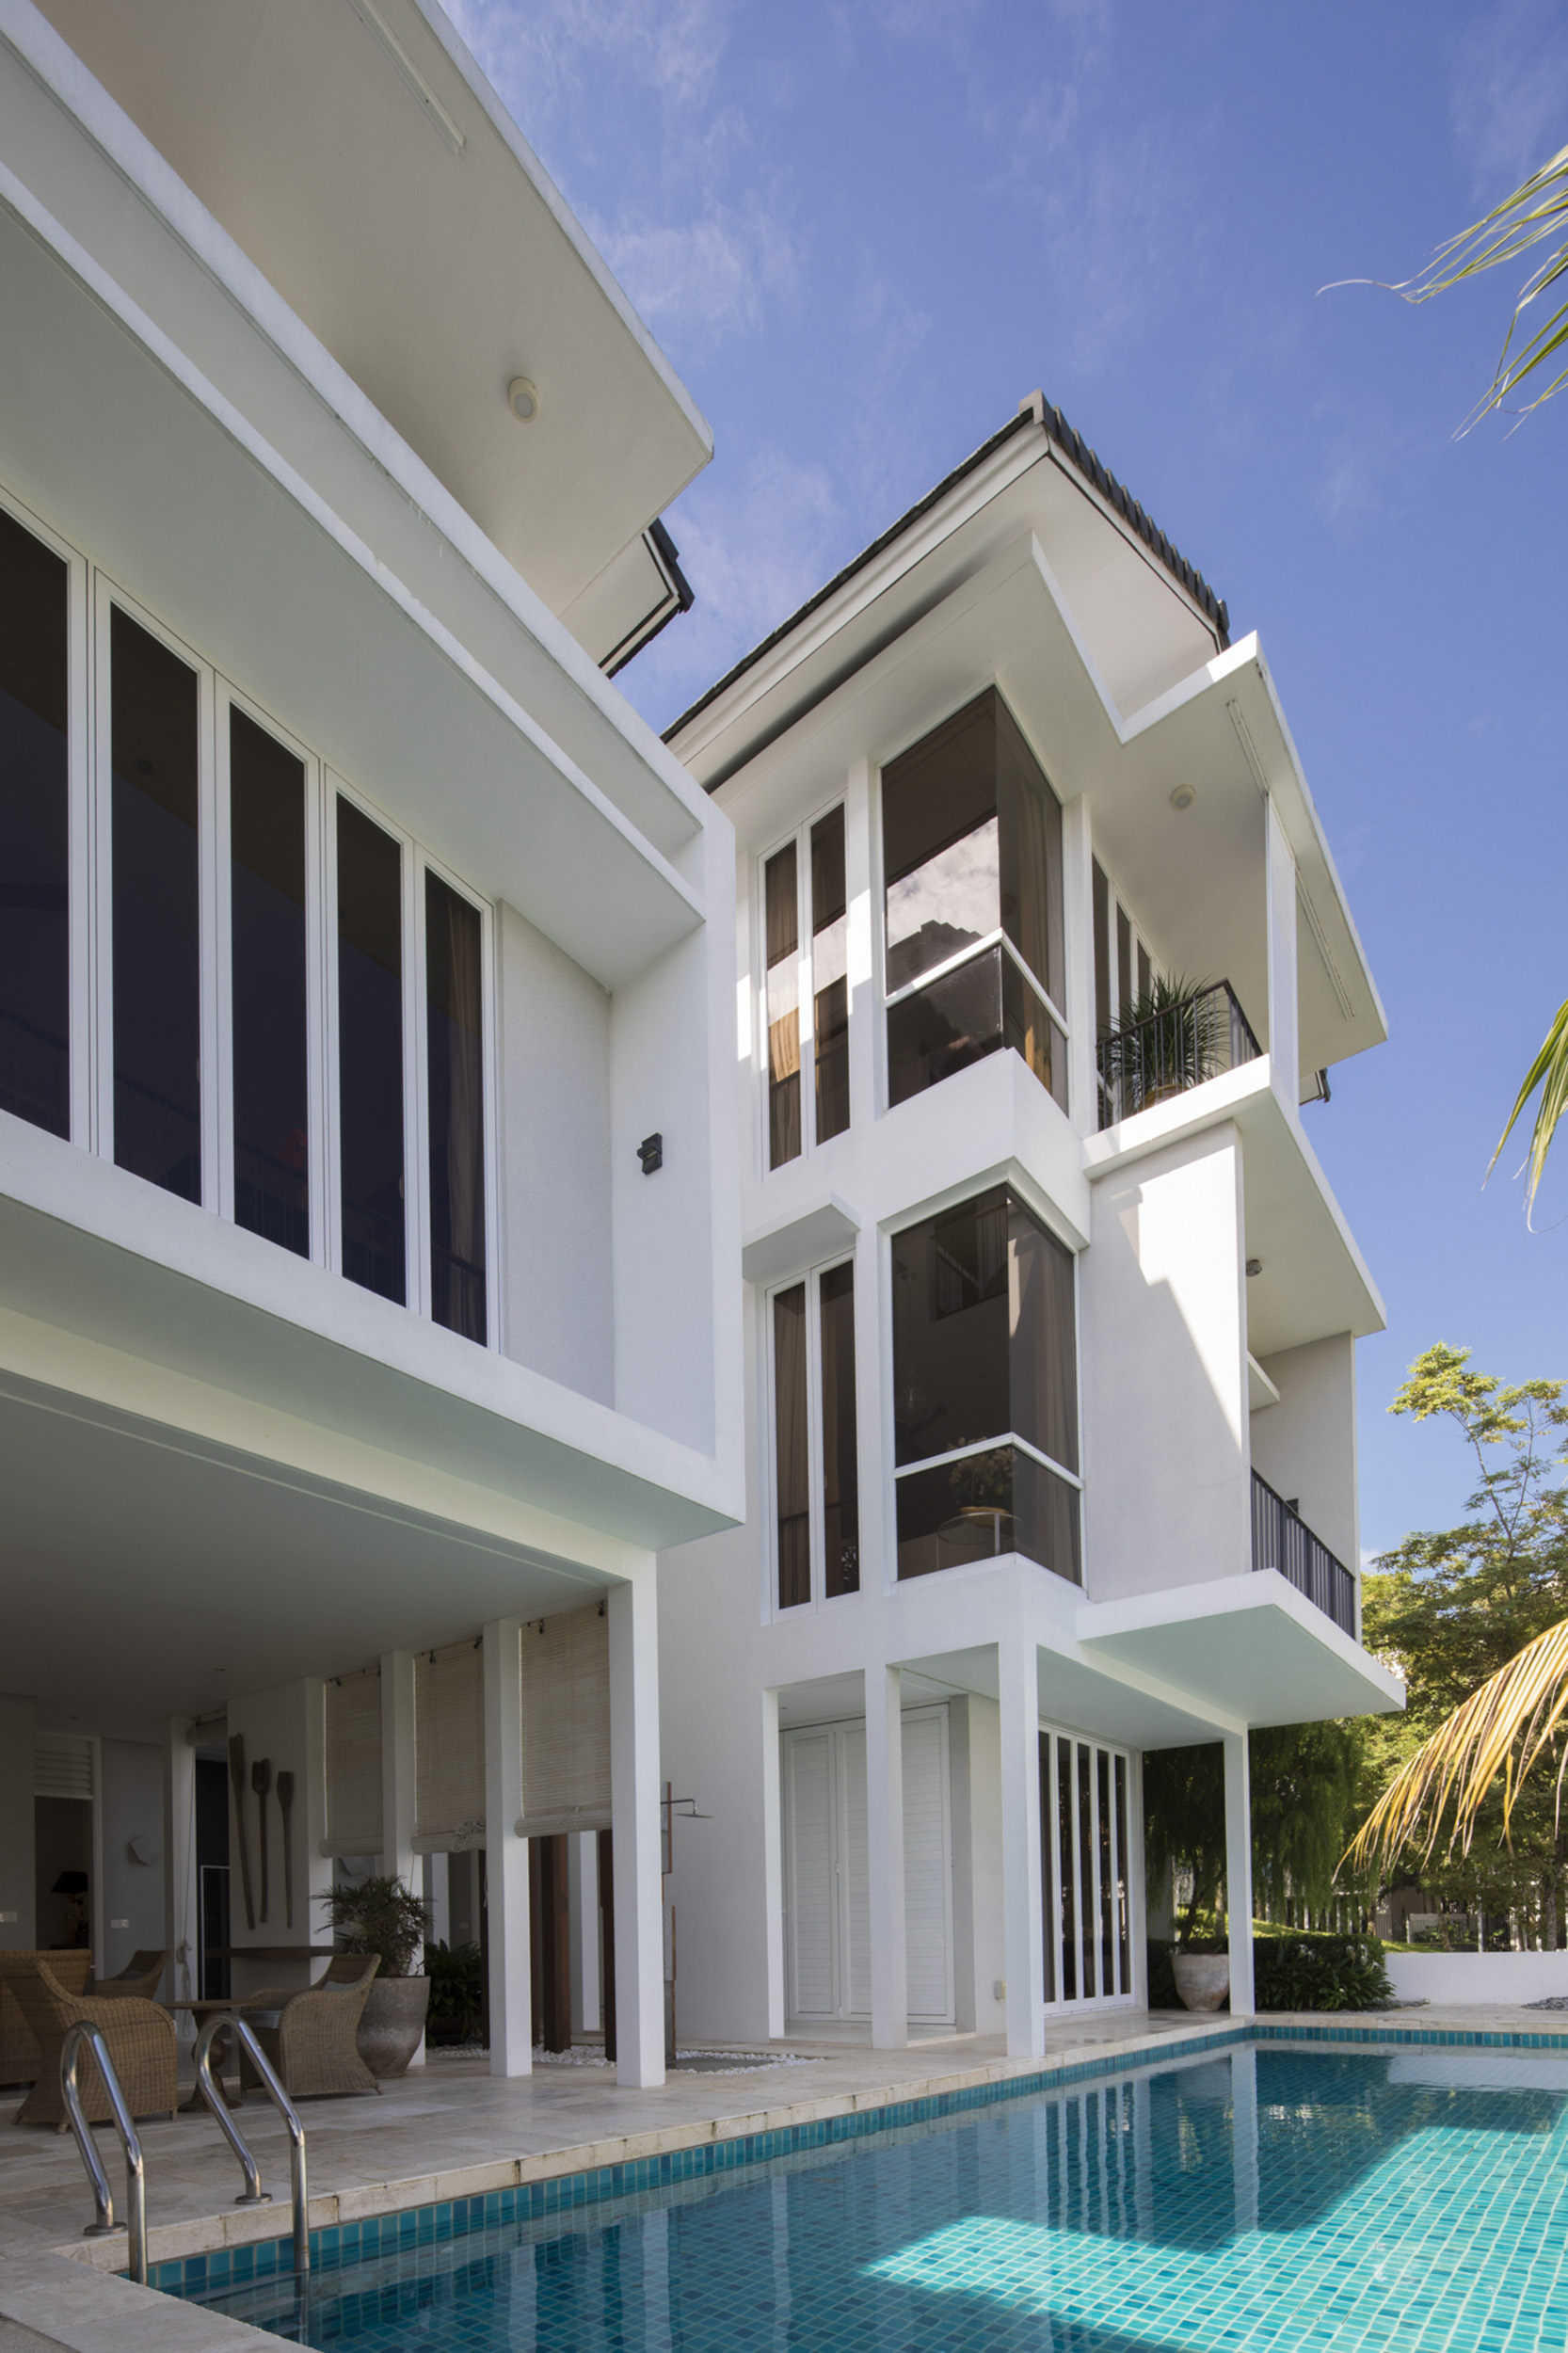 architecture_photography_sydney_australia_118.jpg